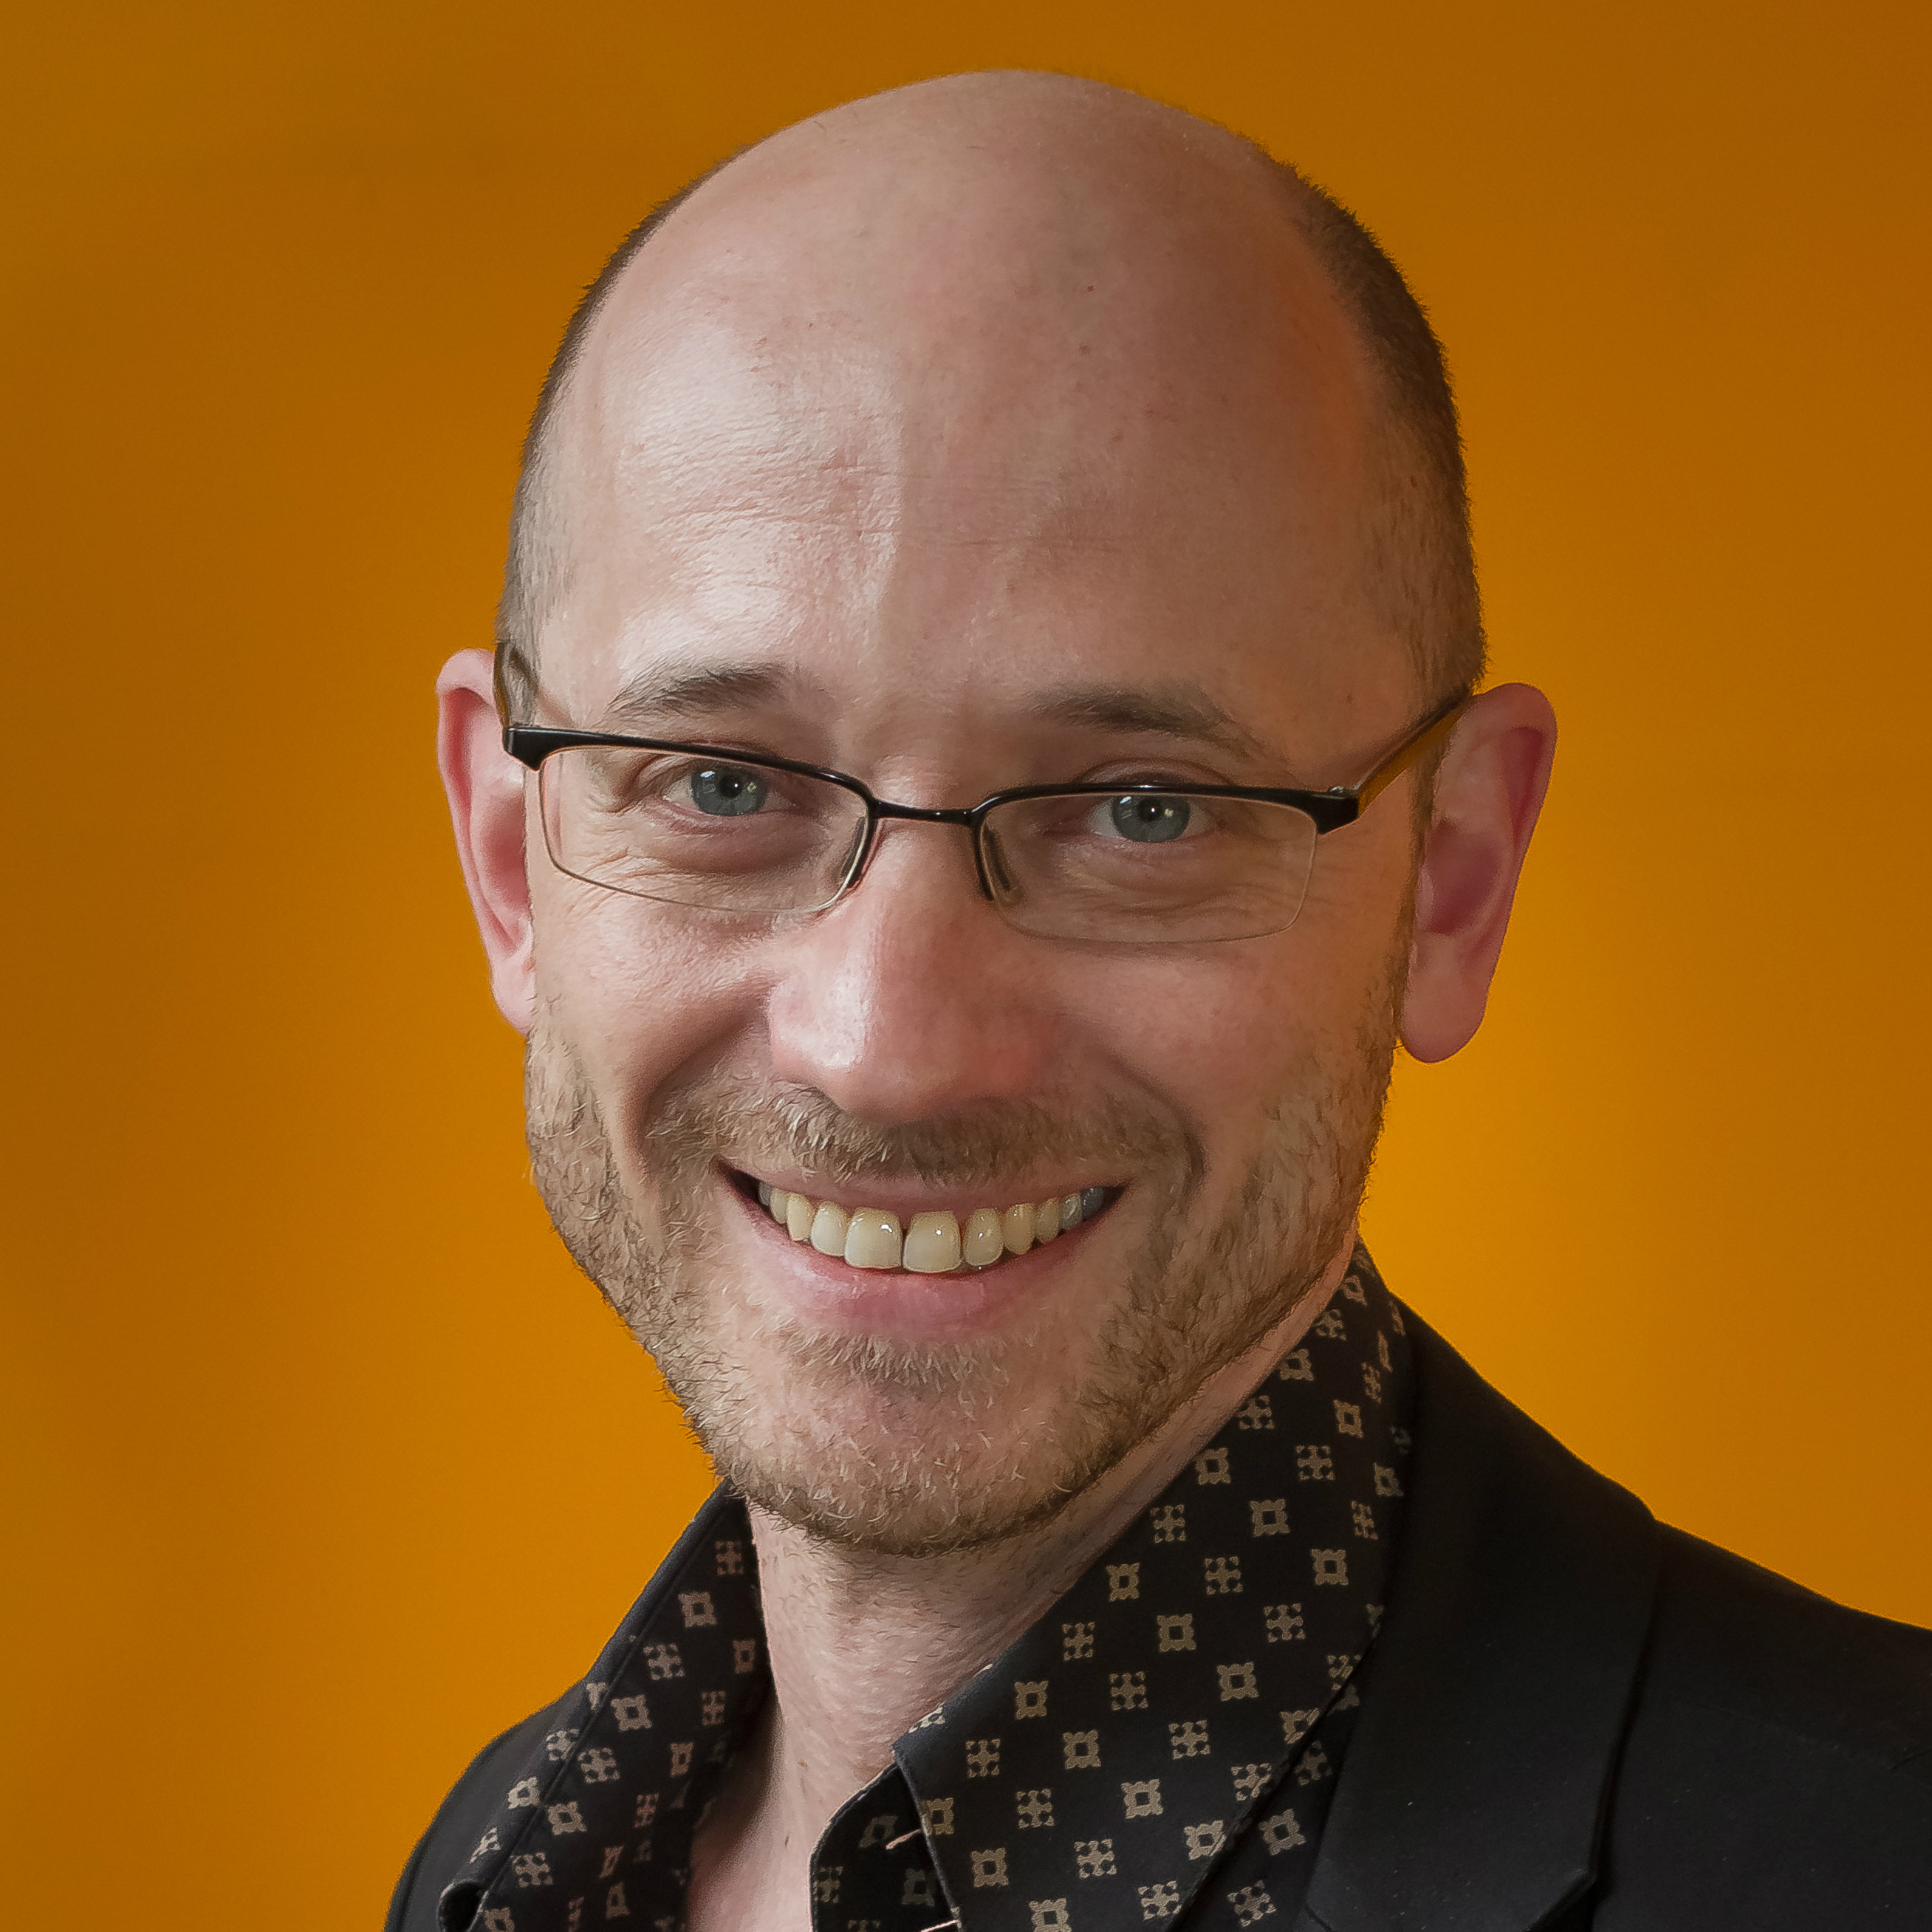 Peter Barbalov